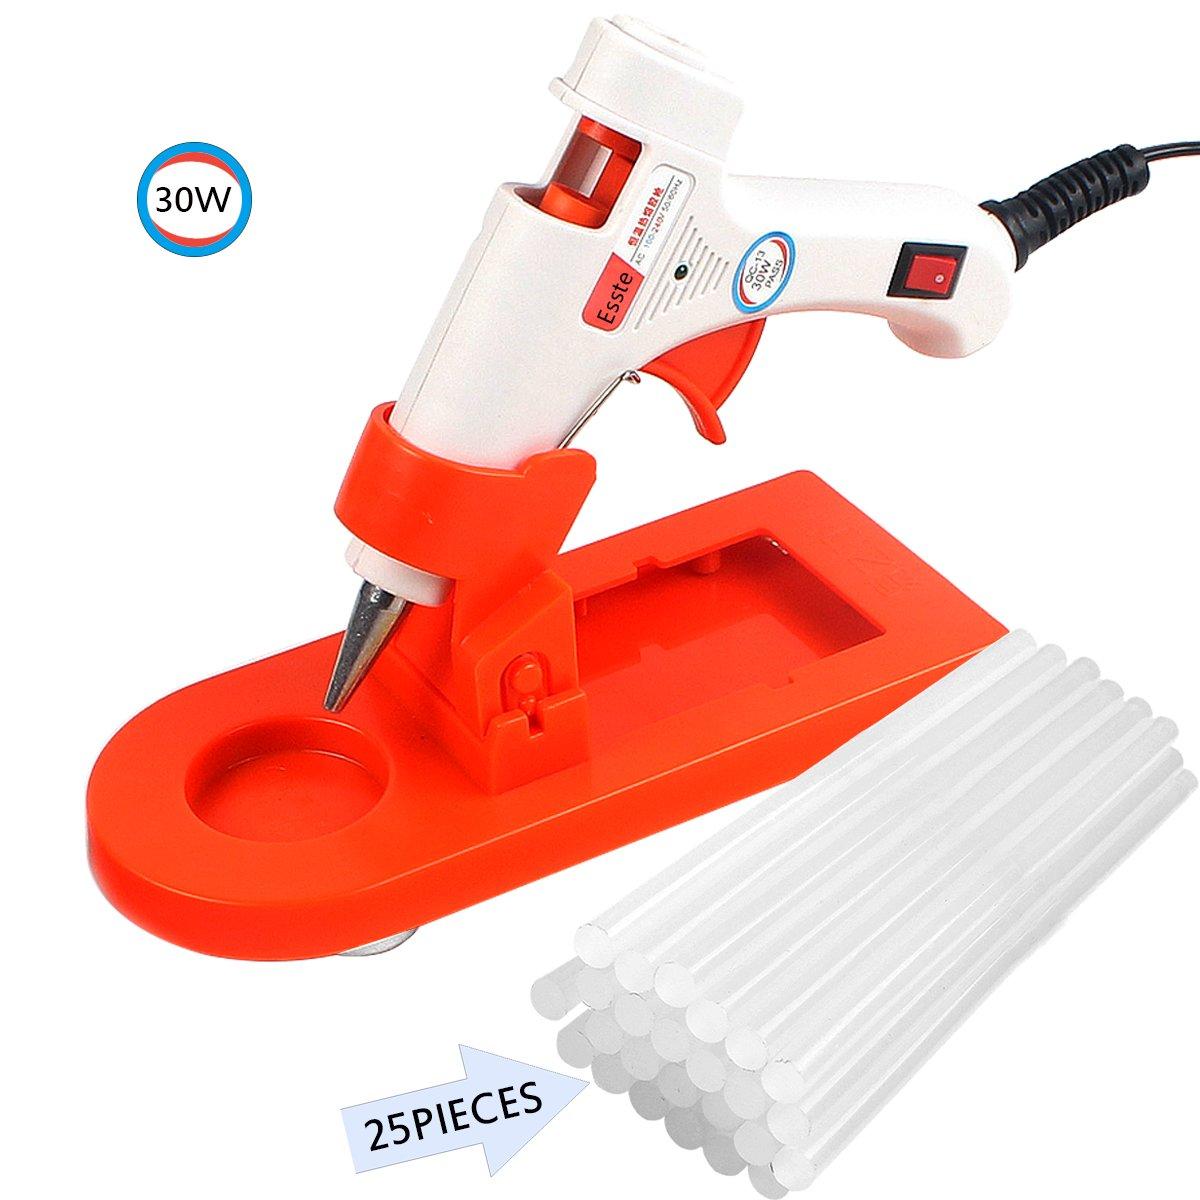 Esste 30W Mini Hot Glue Gun Kit-High Temperature Repair Tool With Gun Stand Socket and 25 Pieces Melt Glue Sticks for DIY Craft Projects Strong Bond (hot gun)